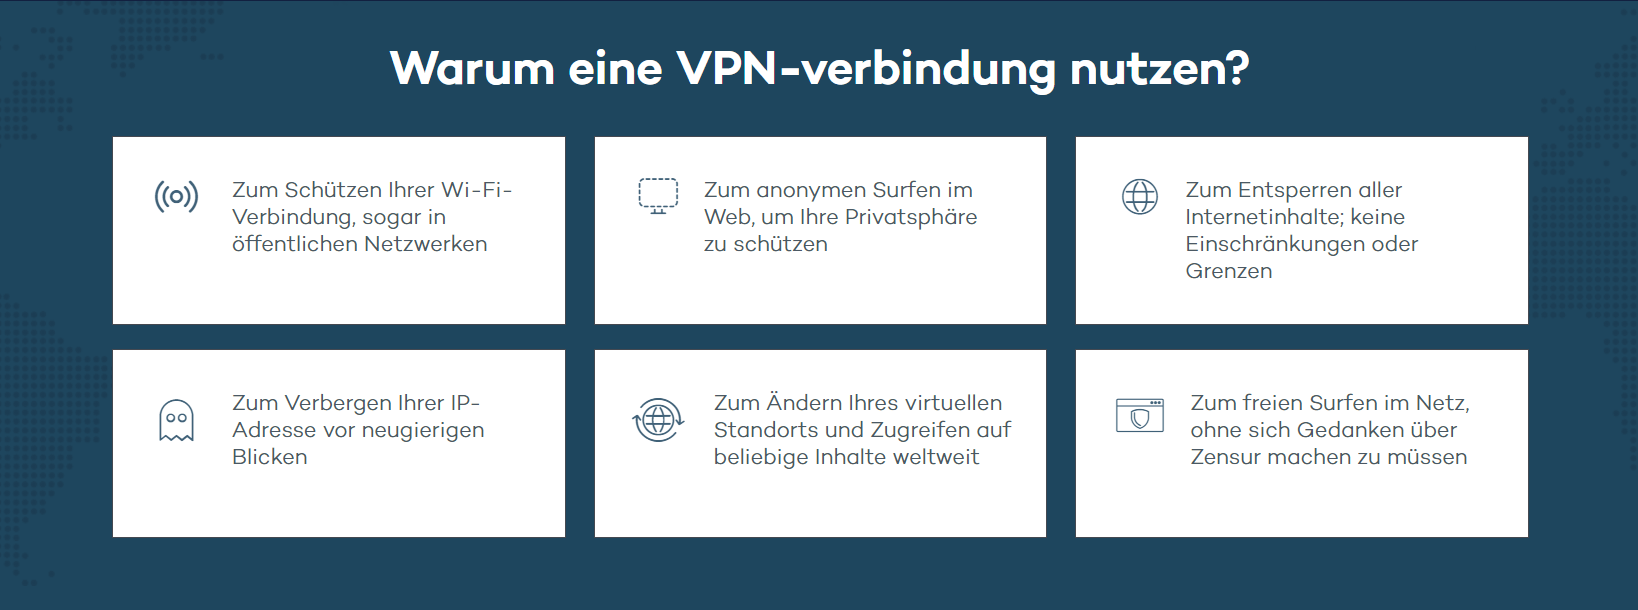 Panda-VPN_Vorteile-VPN